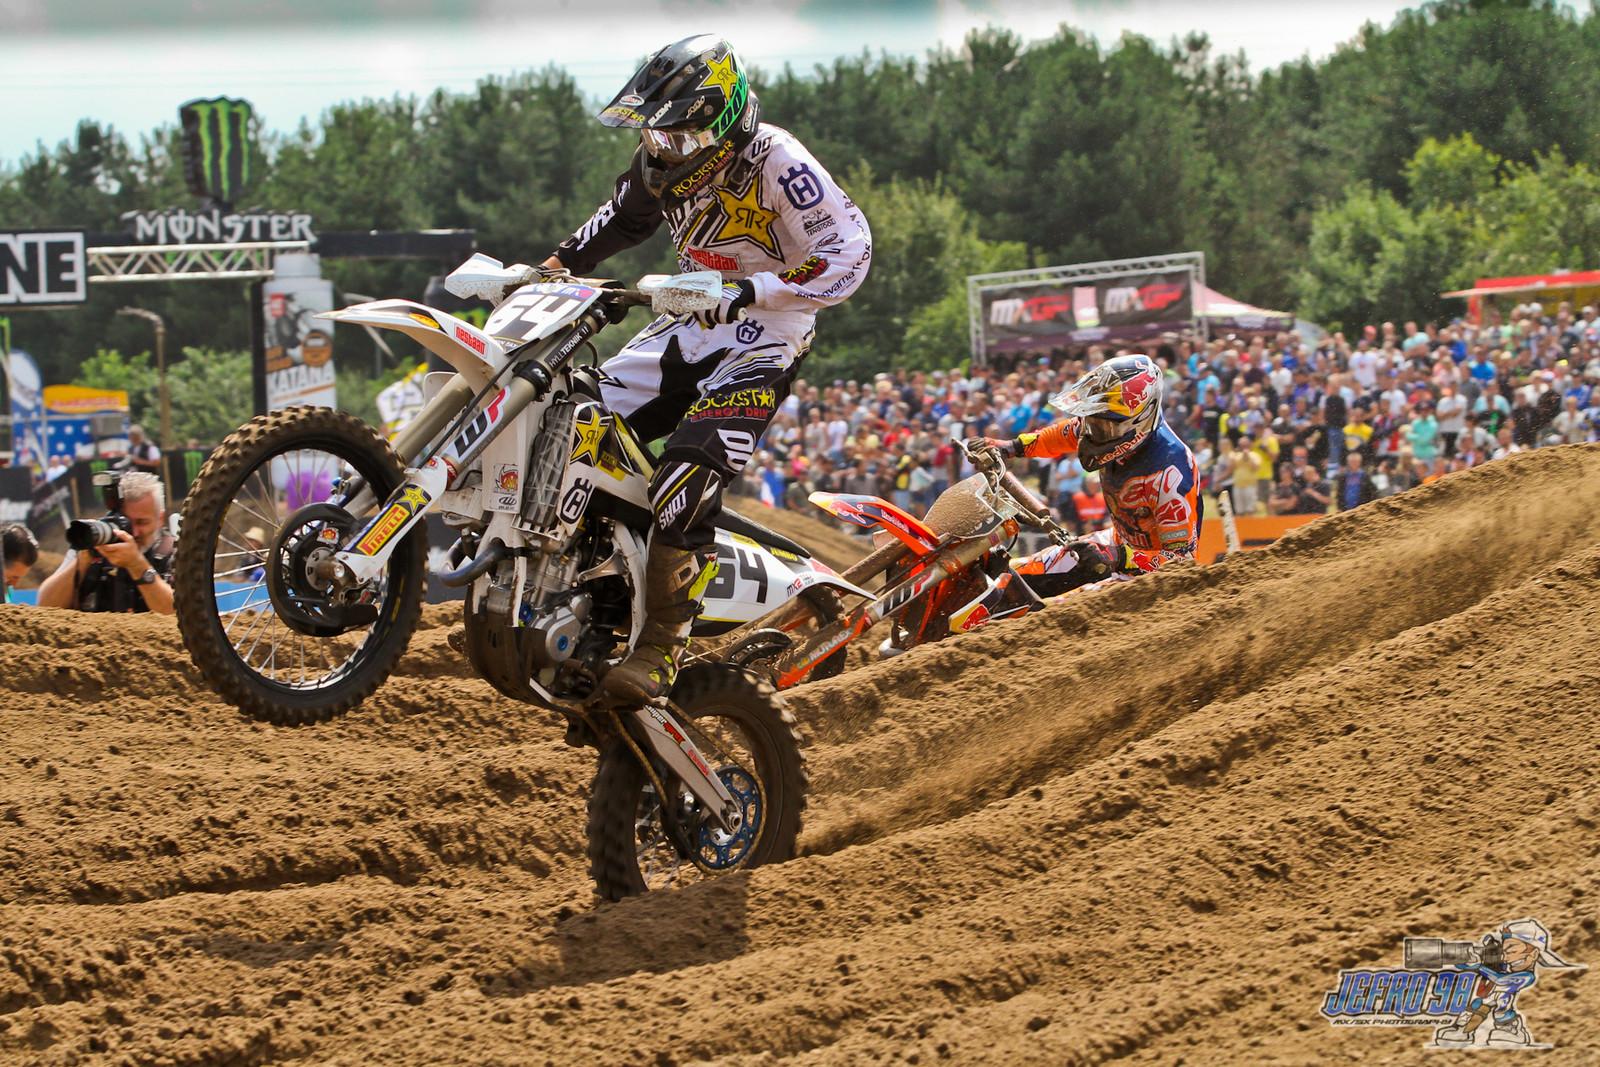 Thomas Covington - Photo Gallery: MXGP of Limburg - Motocross Pictures - Vital MX